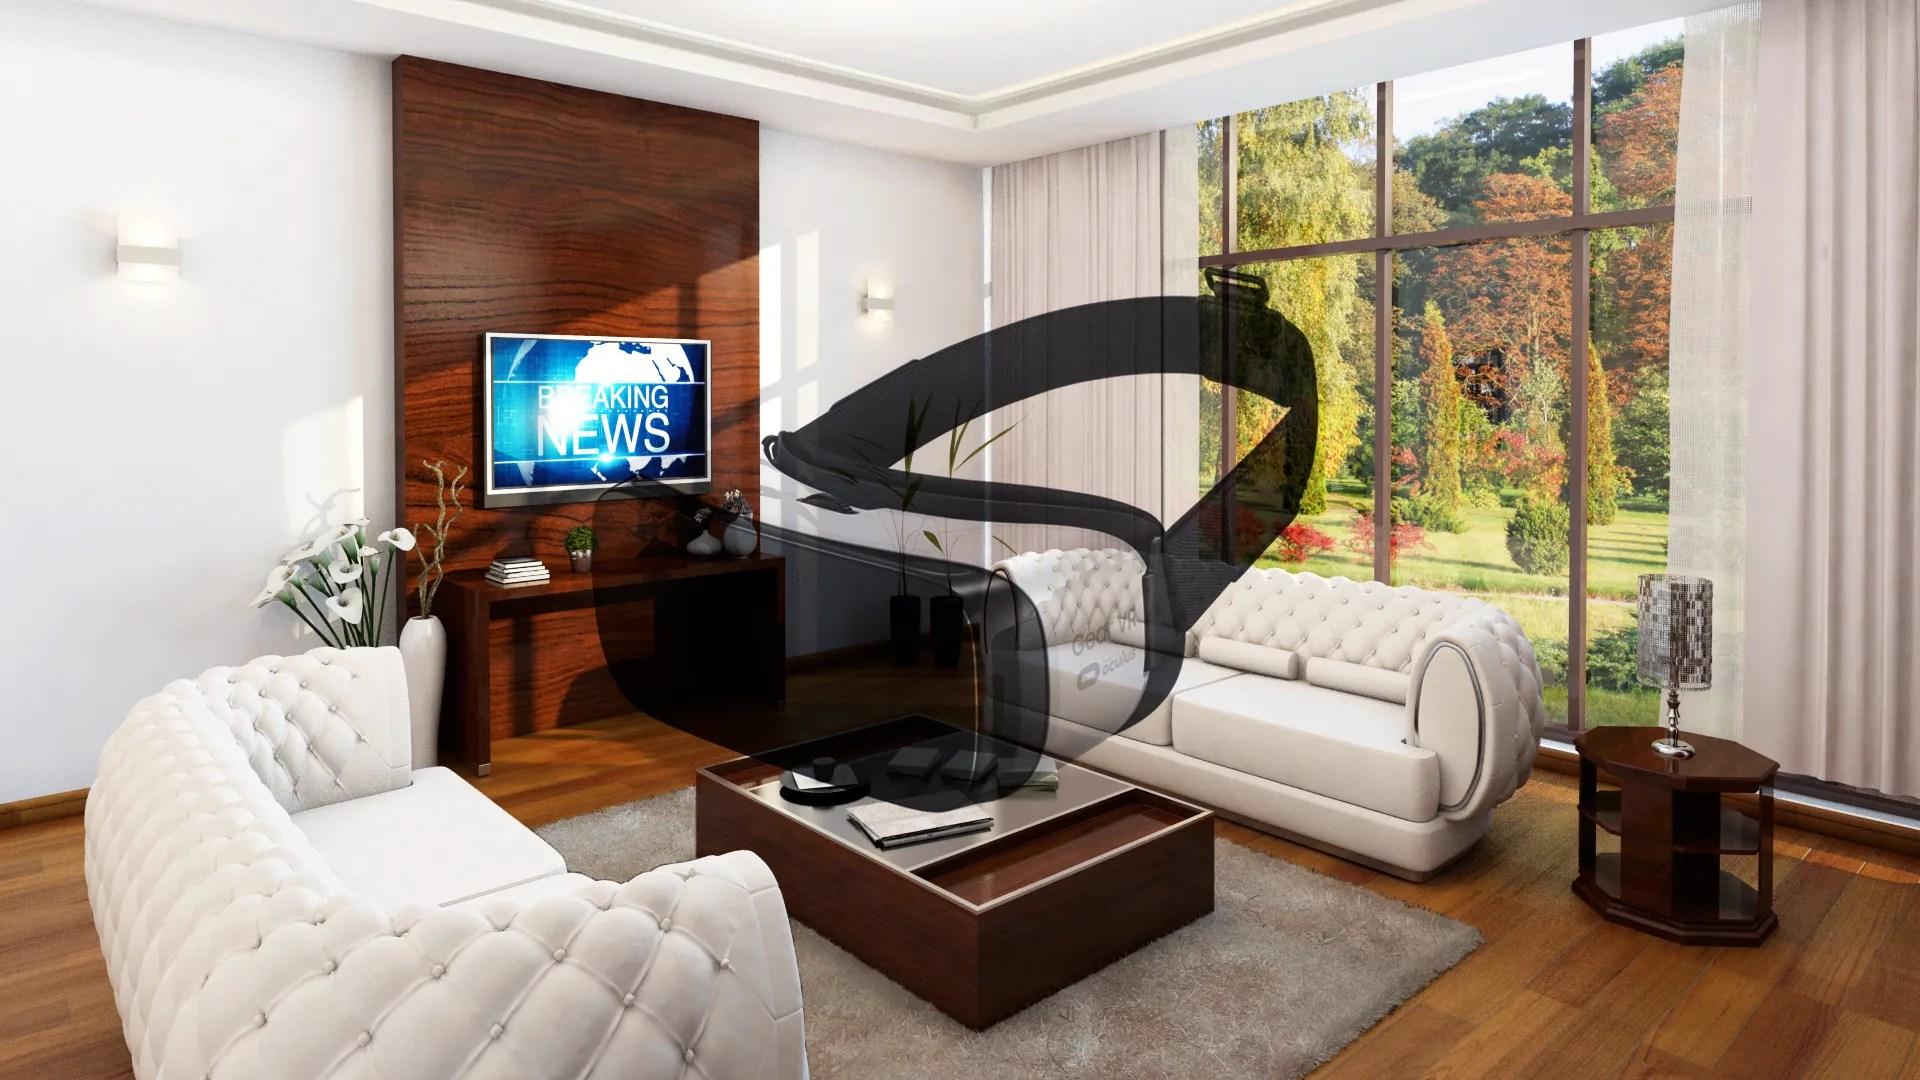 Cubic For Cardboard Virtual Reality Living Room 3d Model Flatpyramid